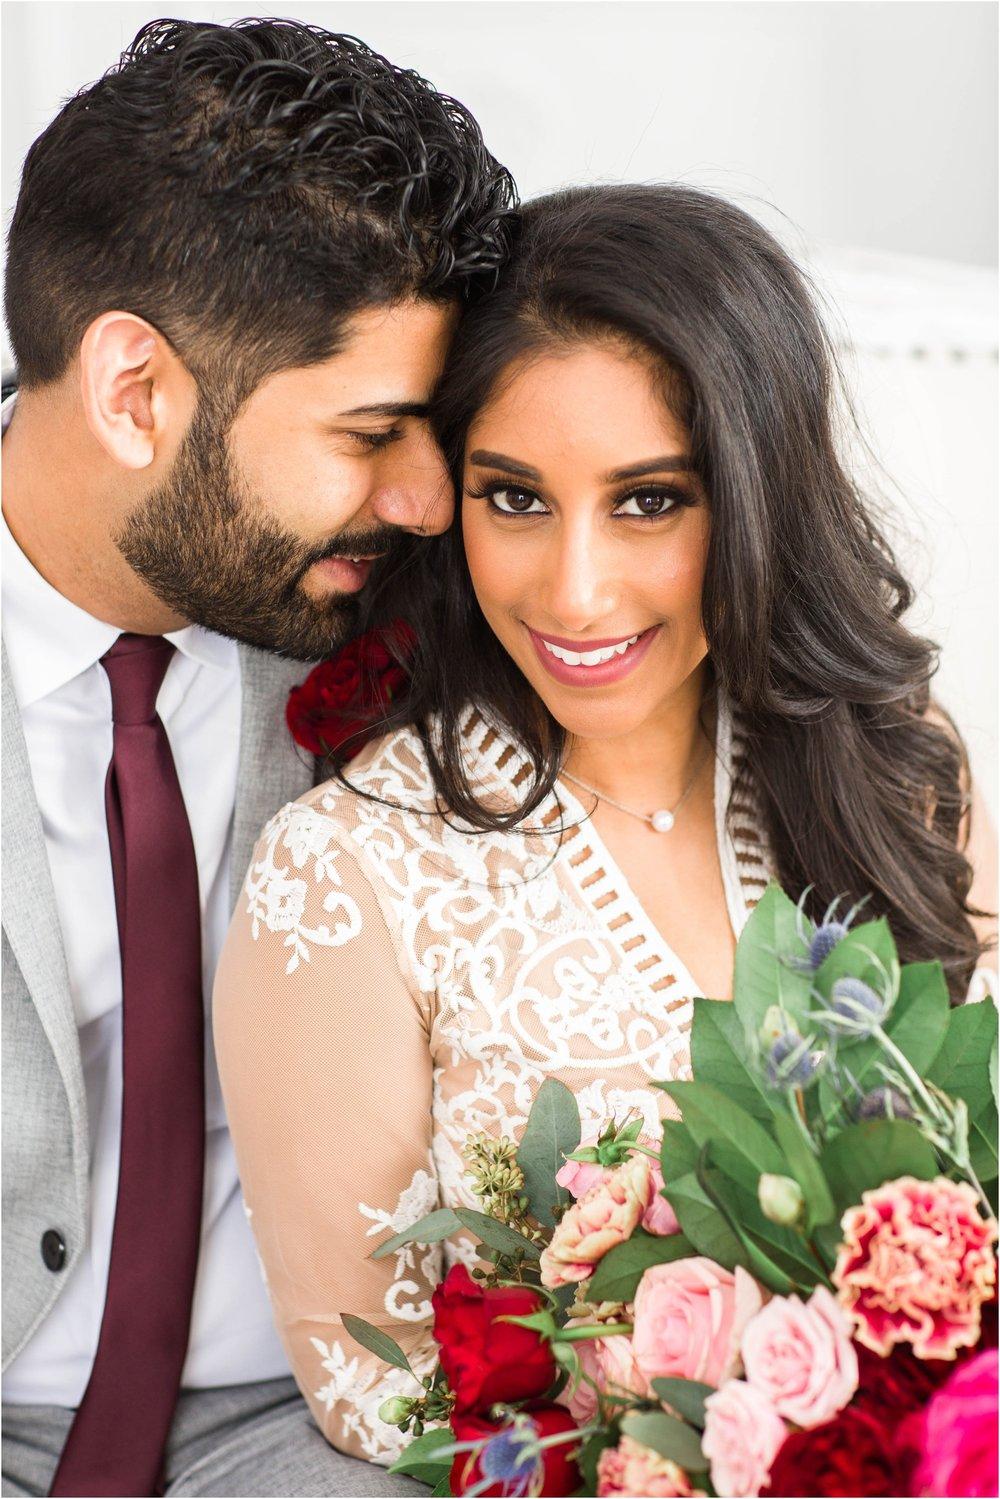 Mint-Room-Studios-Anniversary-Session-Toronto-Mississauga-Brampton-Scarborough-GTA-Pakistani-Indian-Wedding-Engagement-Photographer-Photography_0023.jpg